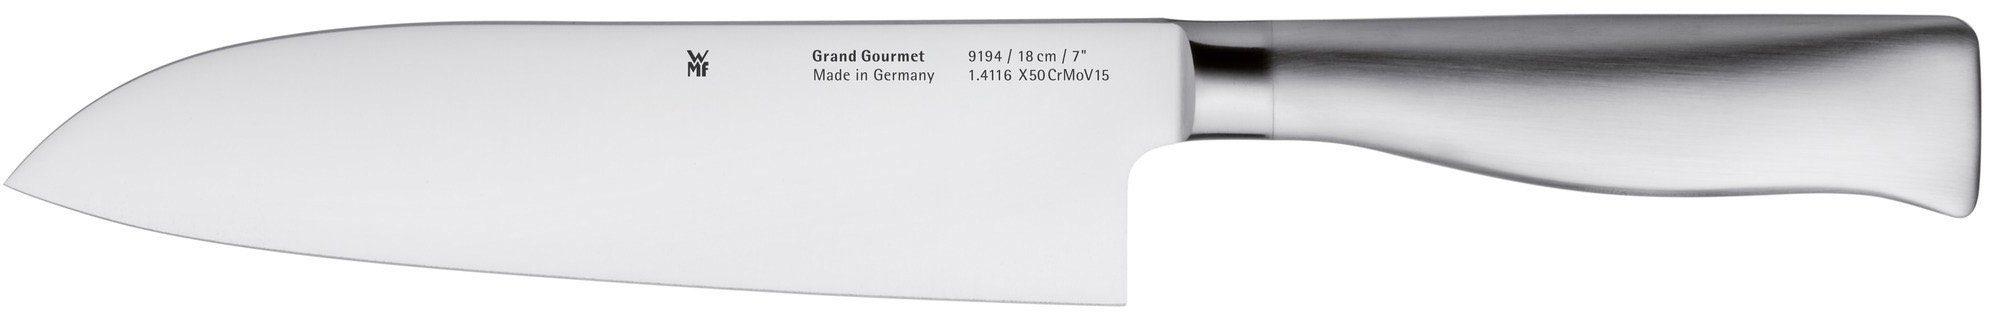 WMF Santokumesser, 18 cm, »GRAND GOURMET«